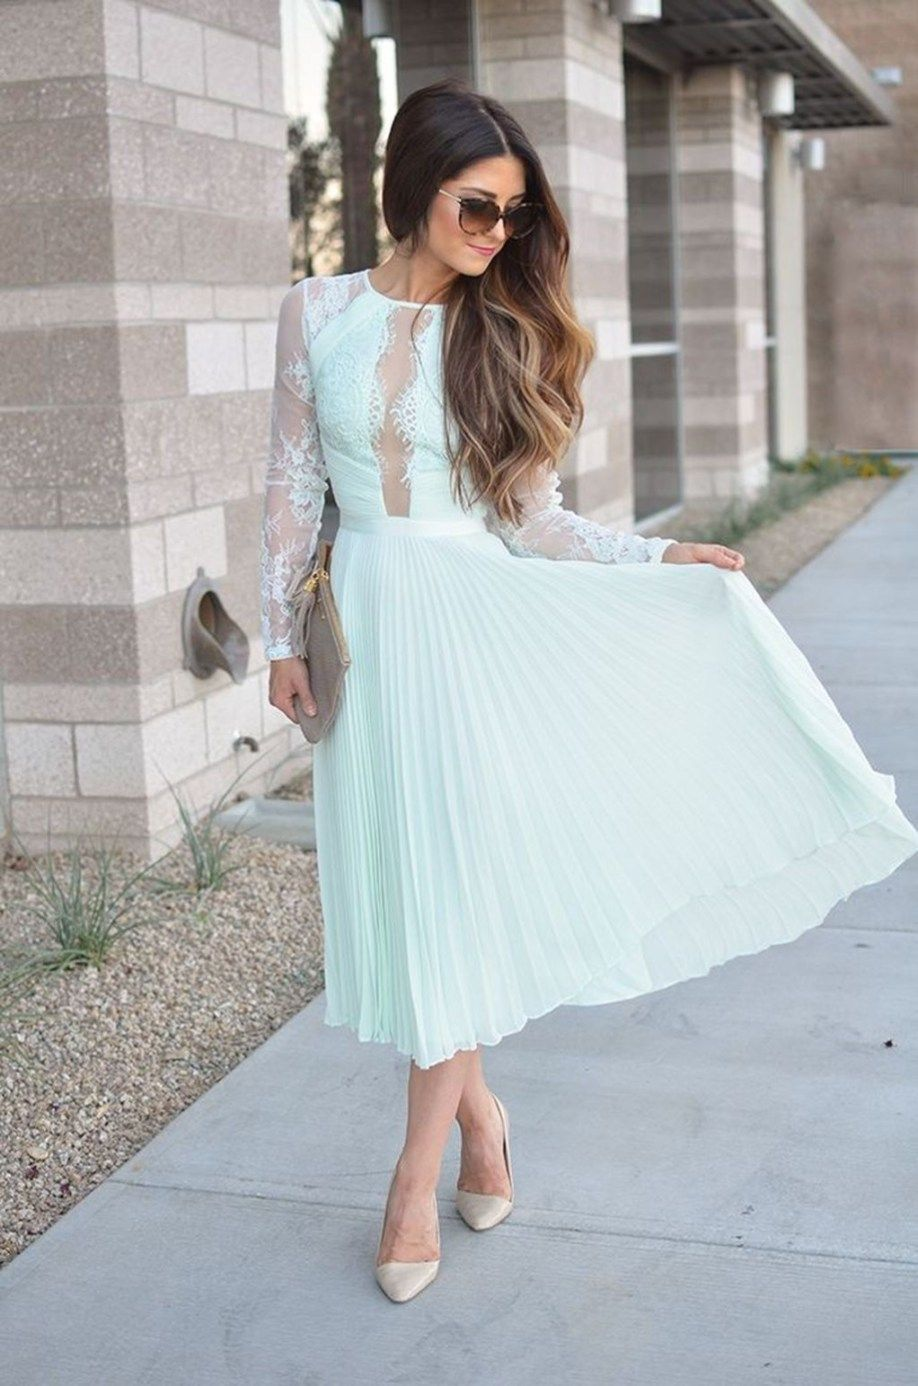 Stylish Long Summer Wedding Guest Dresses15 Lace Wedding Guest Dress Spring Wedding Guest Dress Wedding Attire Guest [ 1386 x 918 Pixel ]